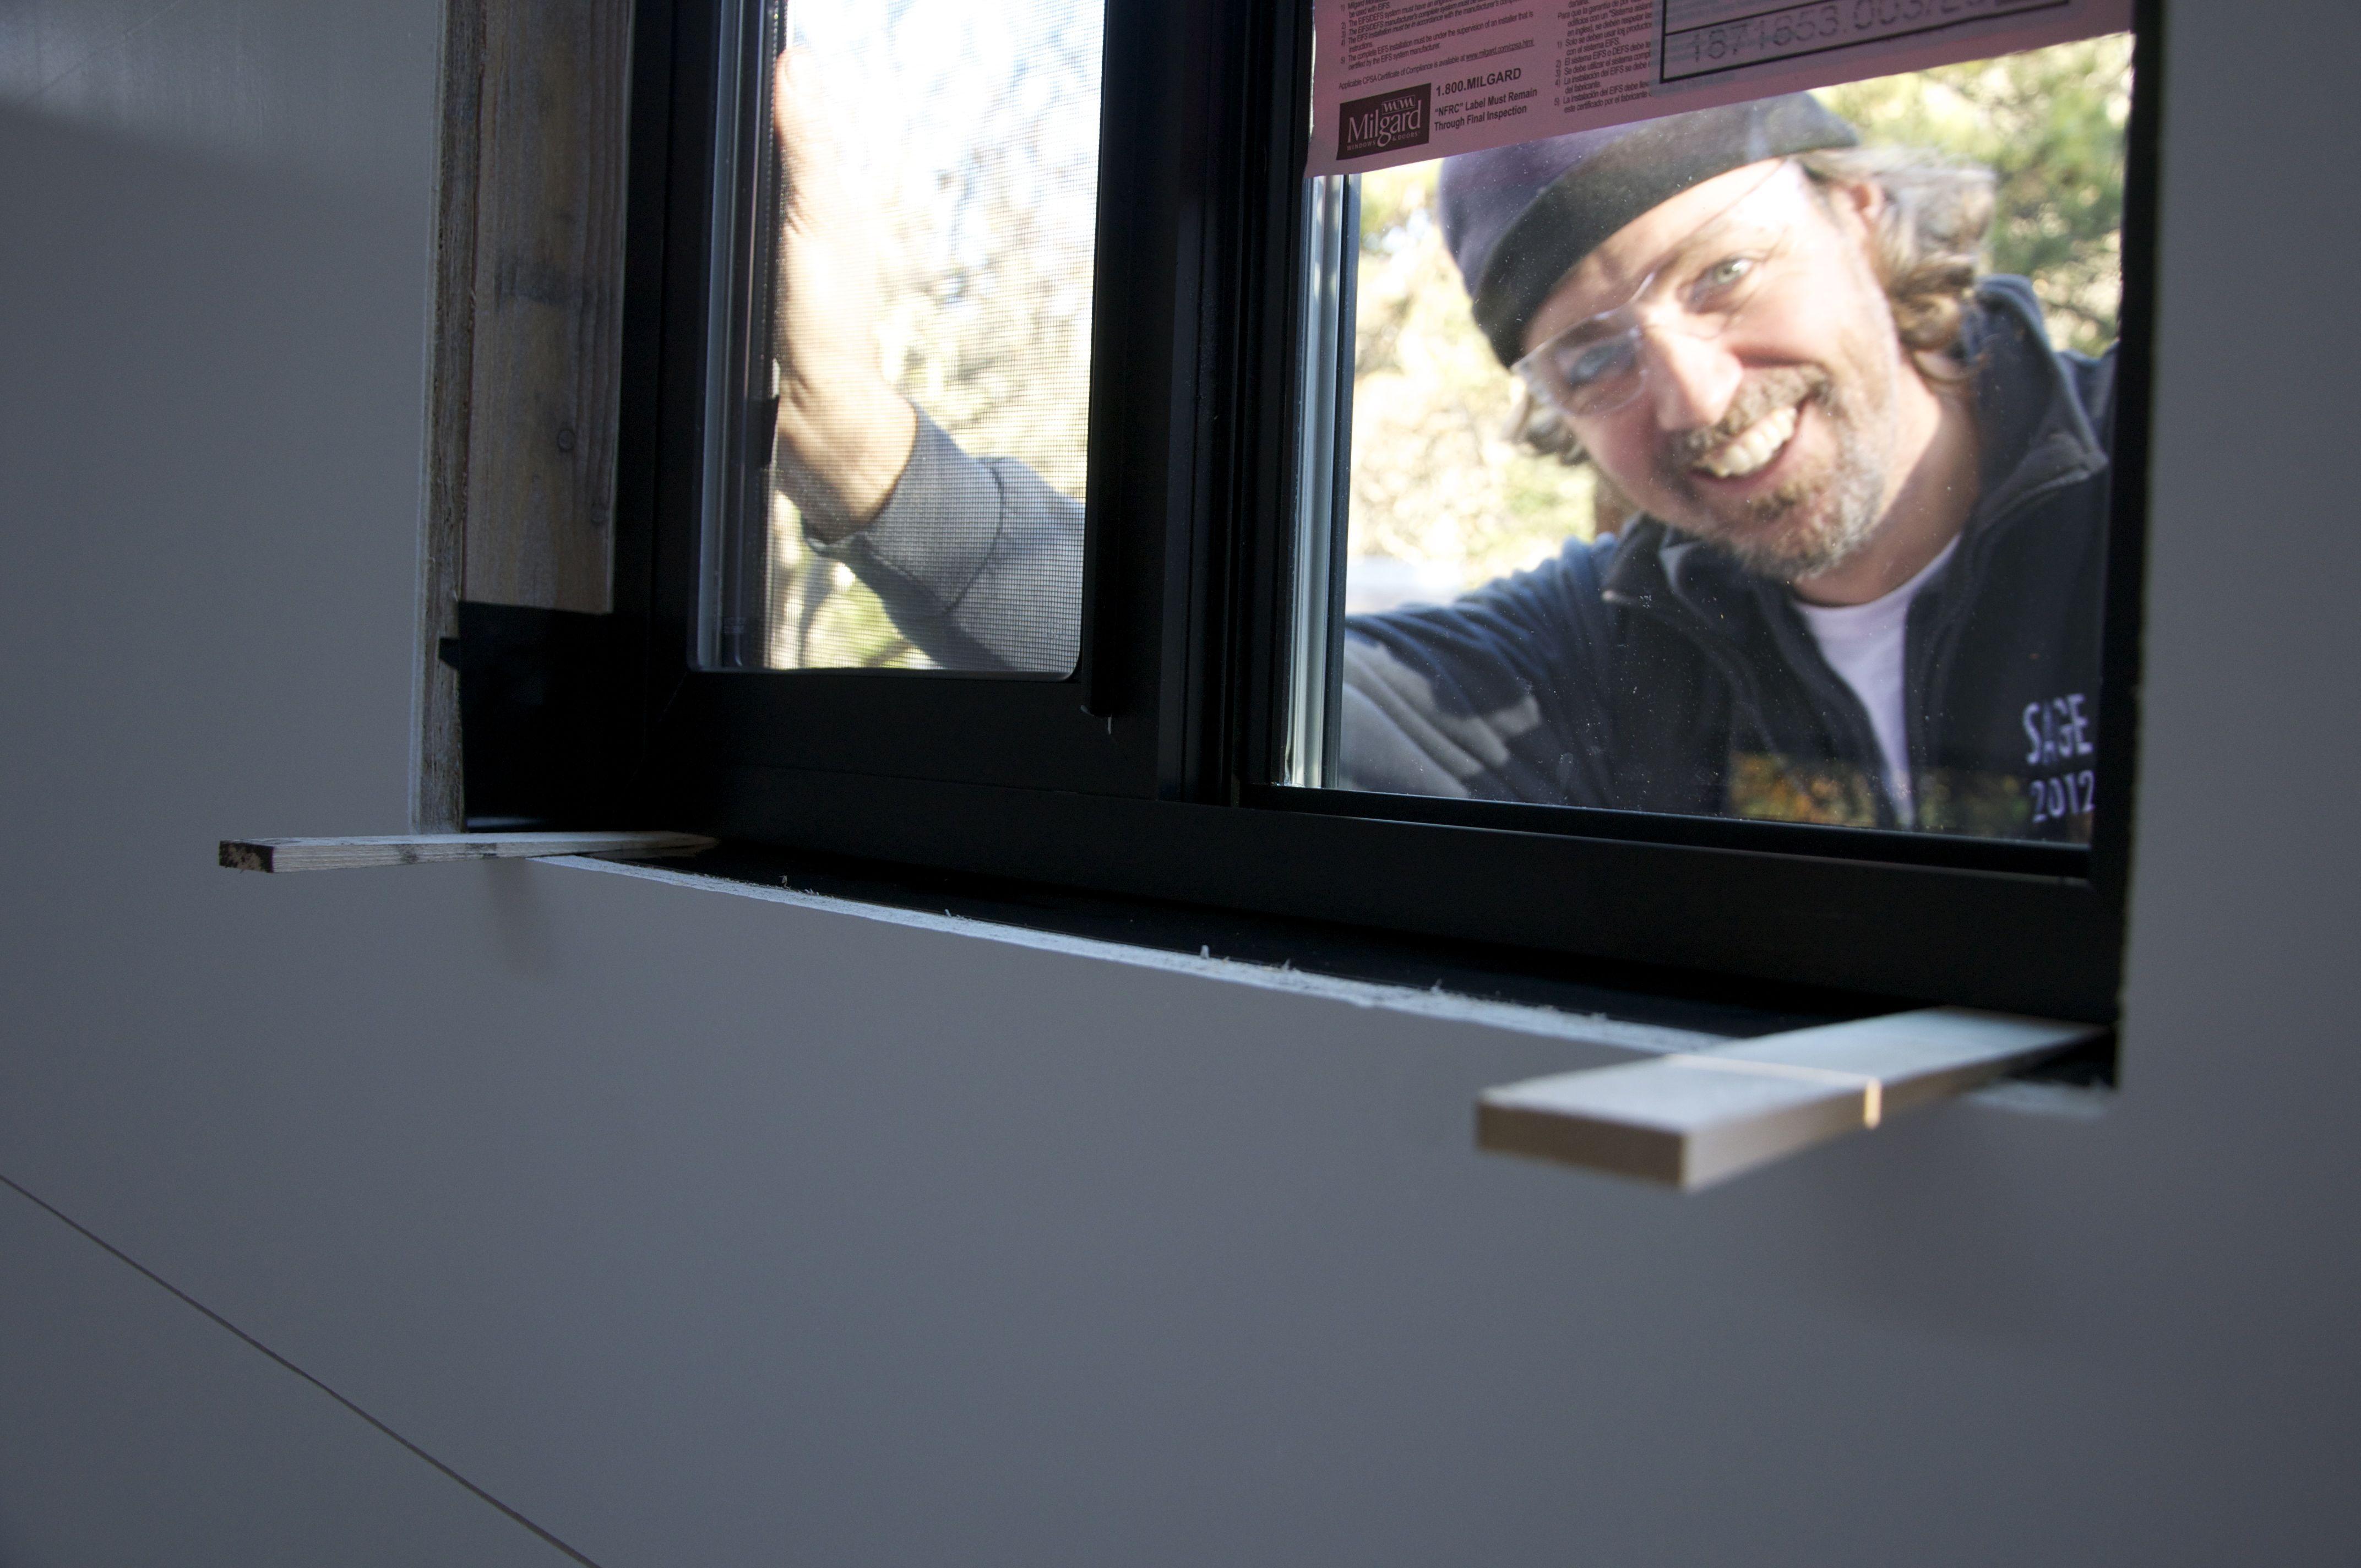 How to properly install flash tiny house windows